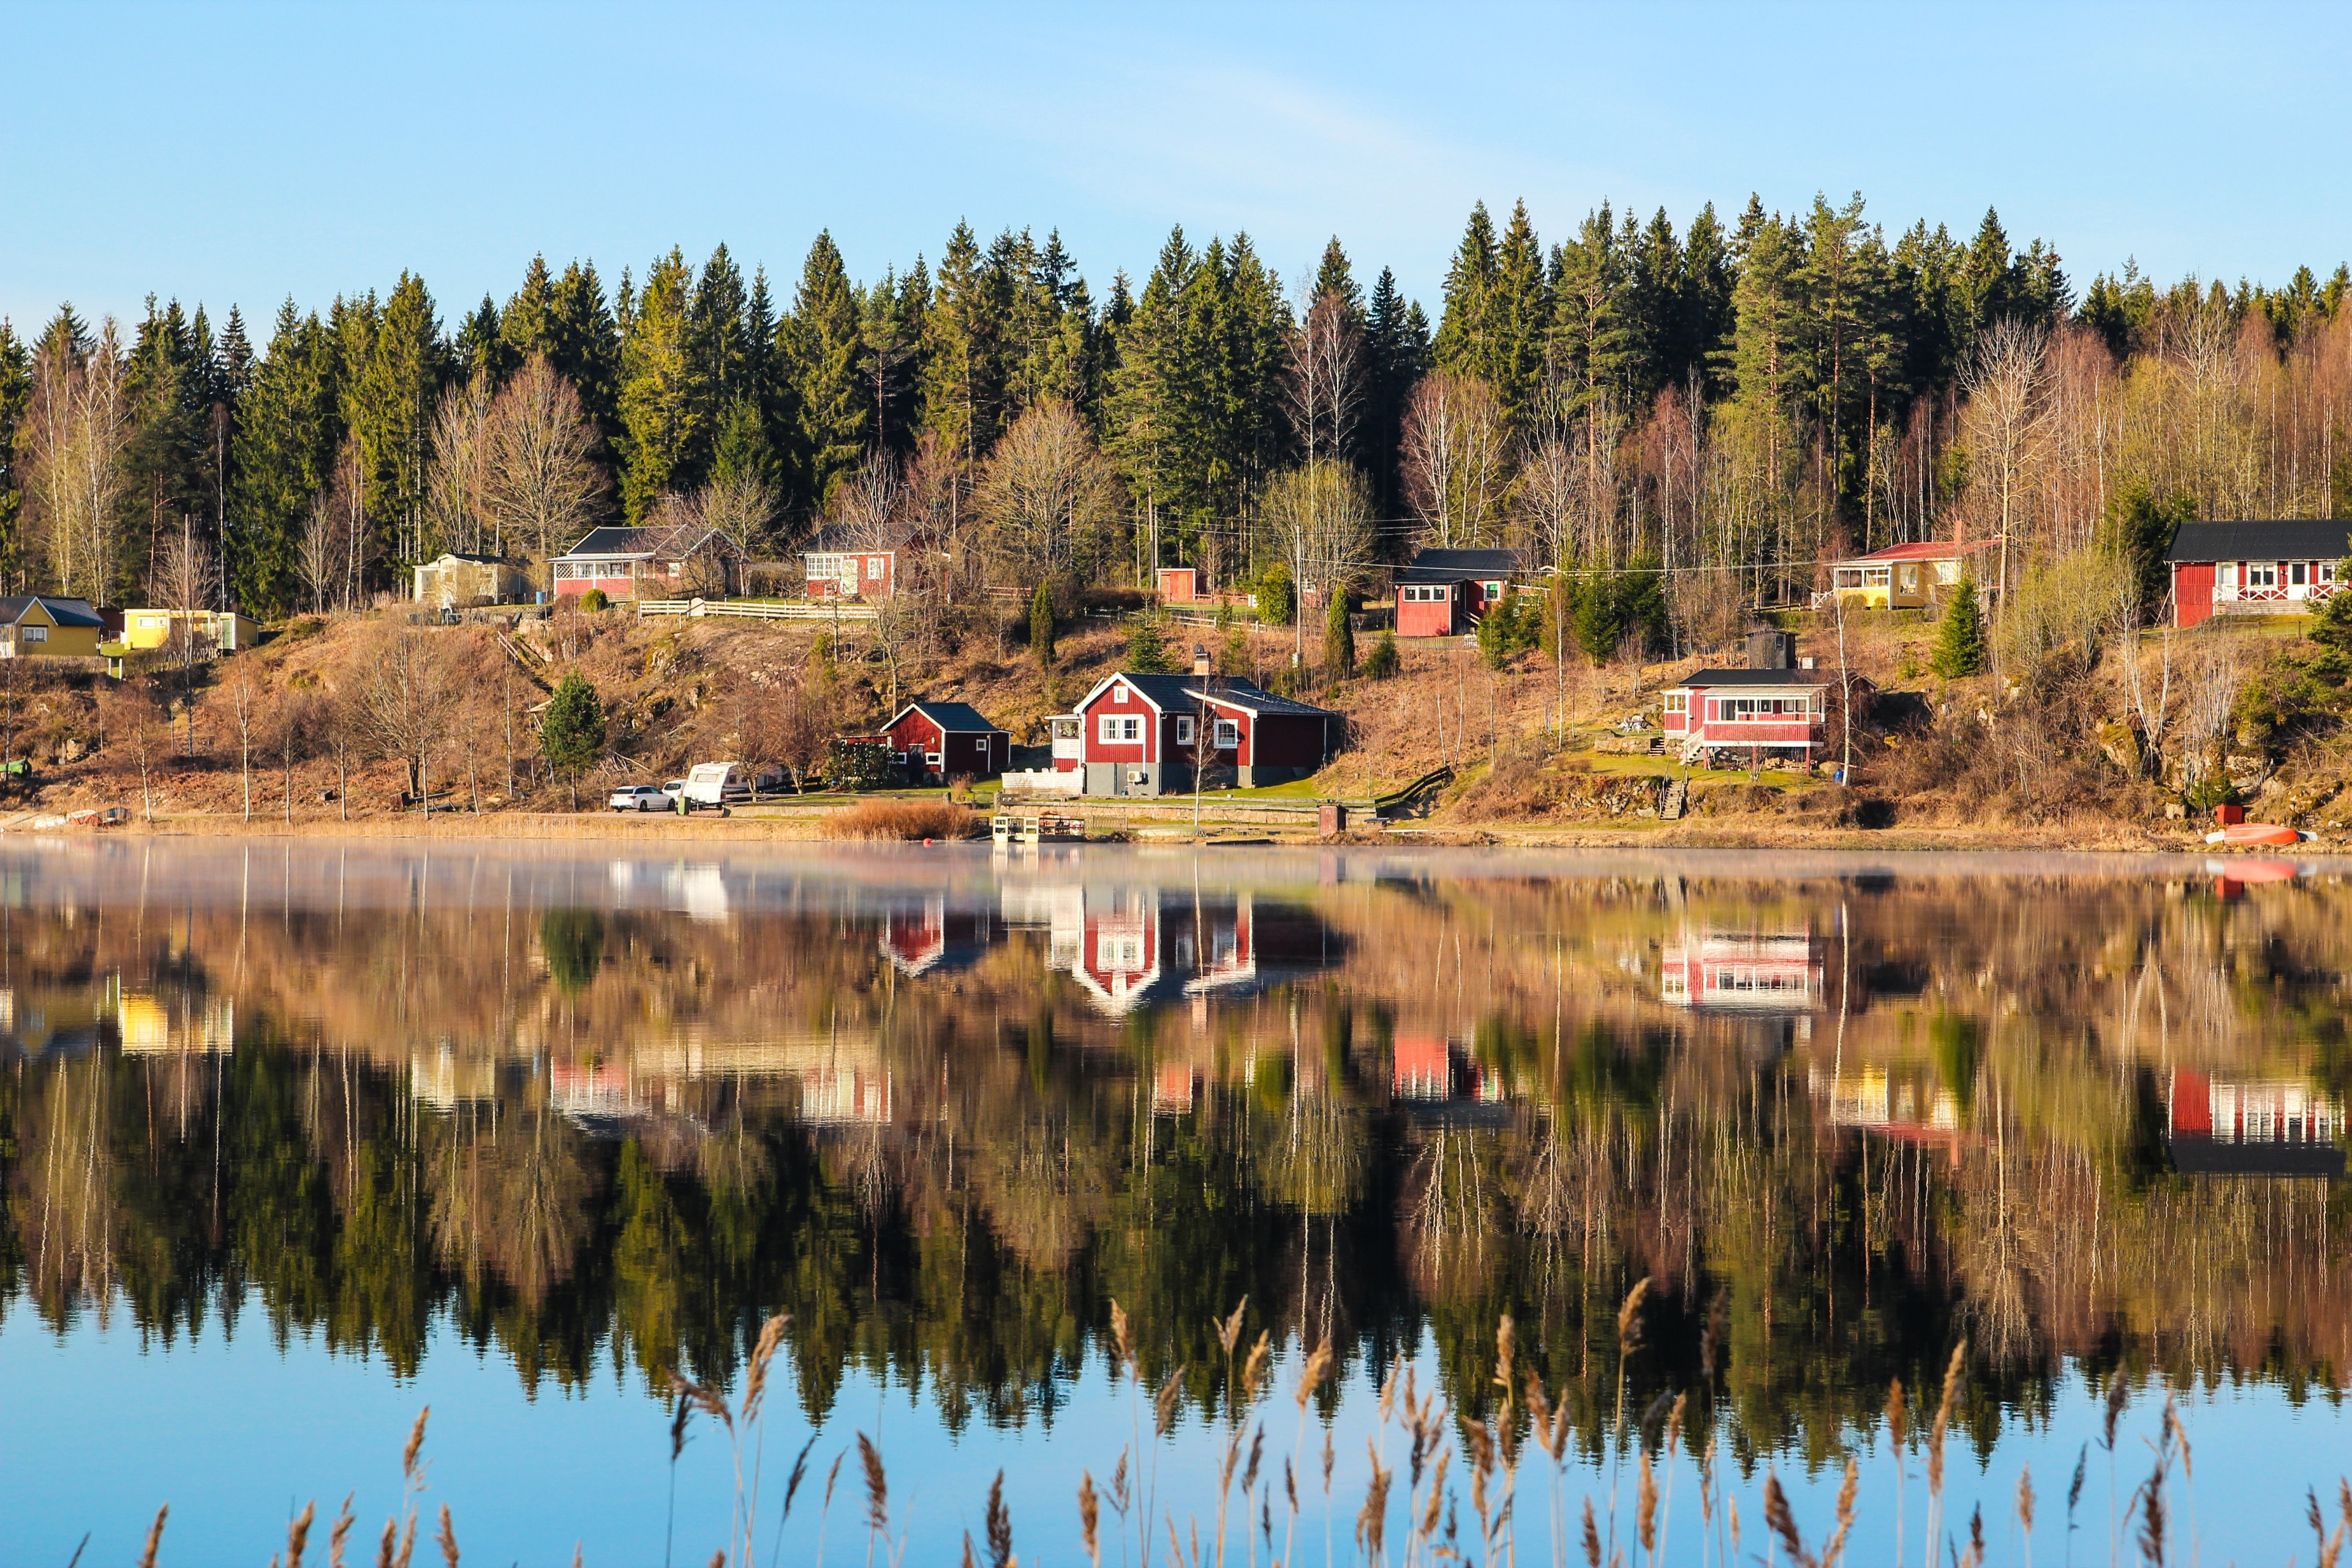 Vimmerby, Kalmar County, Sweden